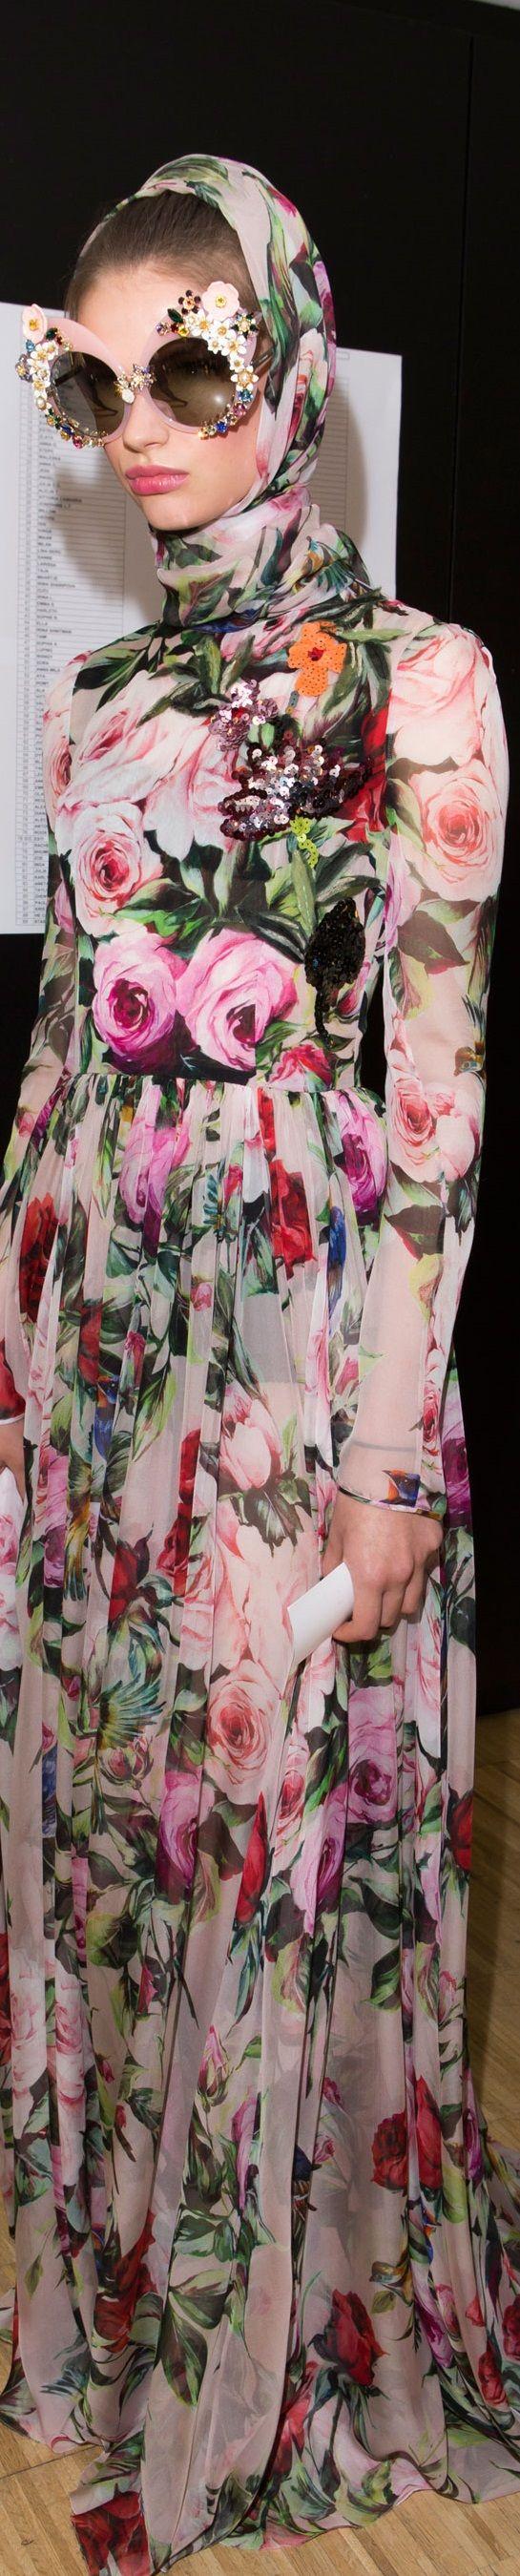 ♔ g r a n n y 's g o o d w i l l {granny inspired chic is quaint} Dolce & Gabbana Spring 2016 RTW vogue